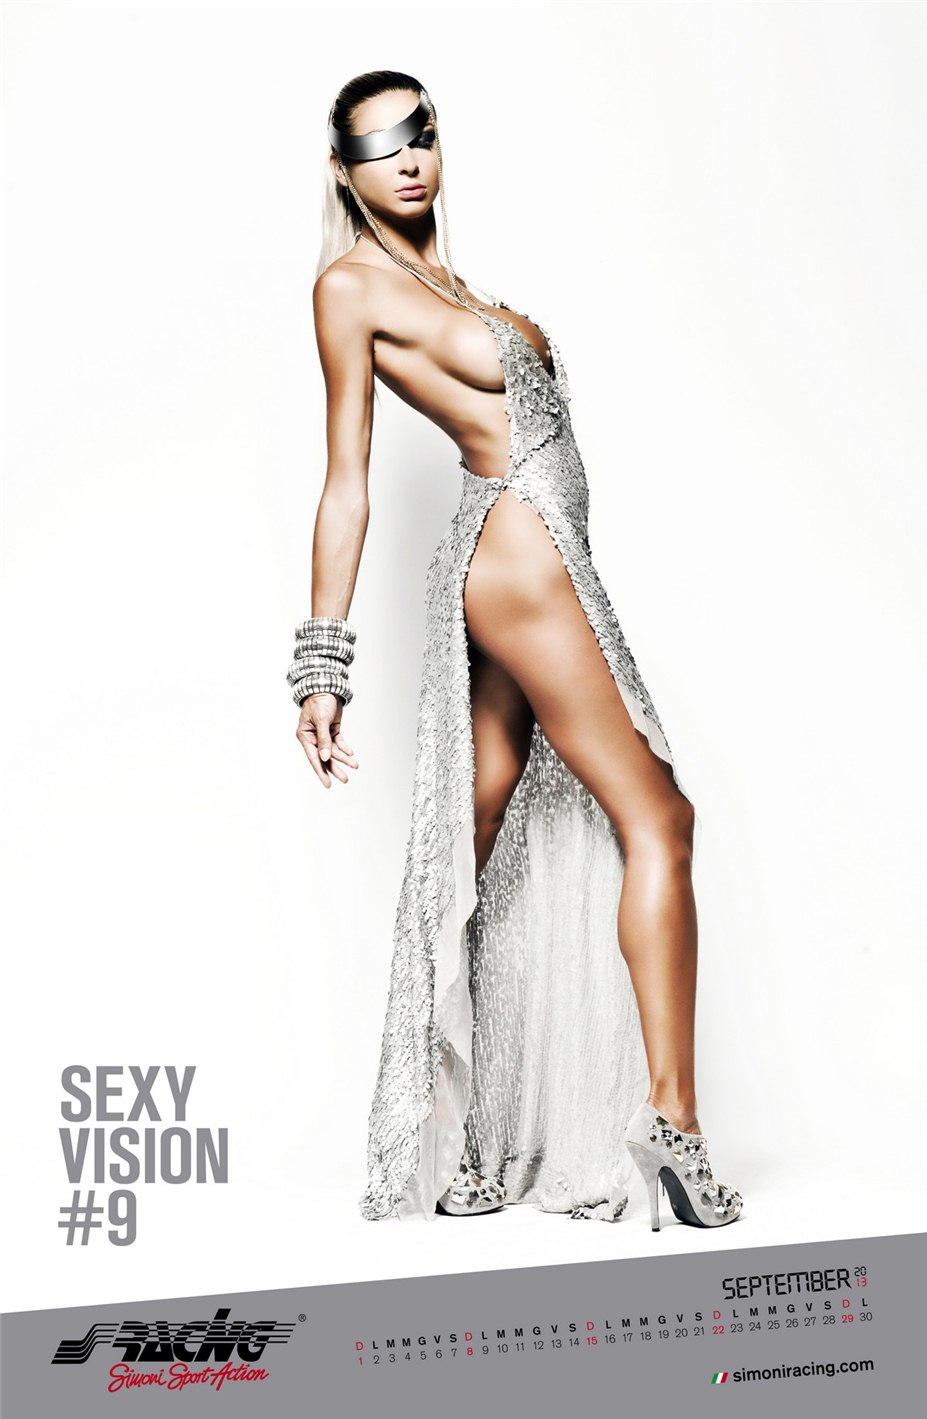 Simoni Racing - Sexy Vision эротический календарь на 2013 год